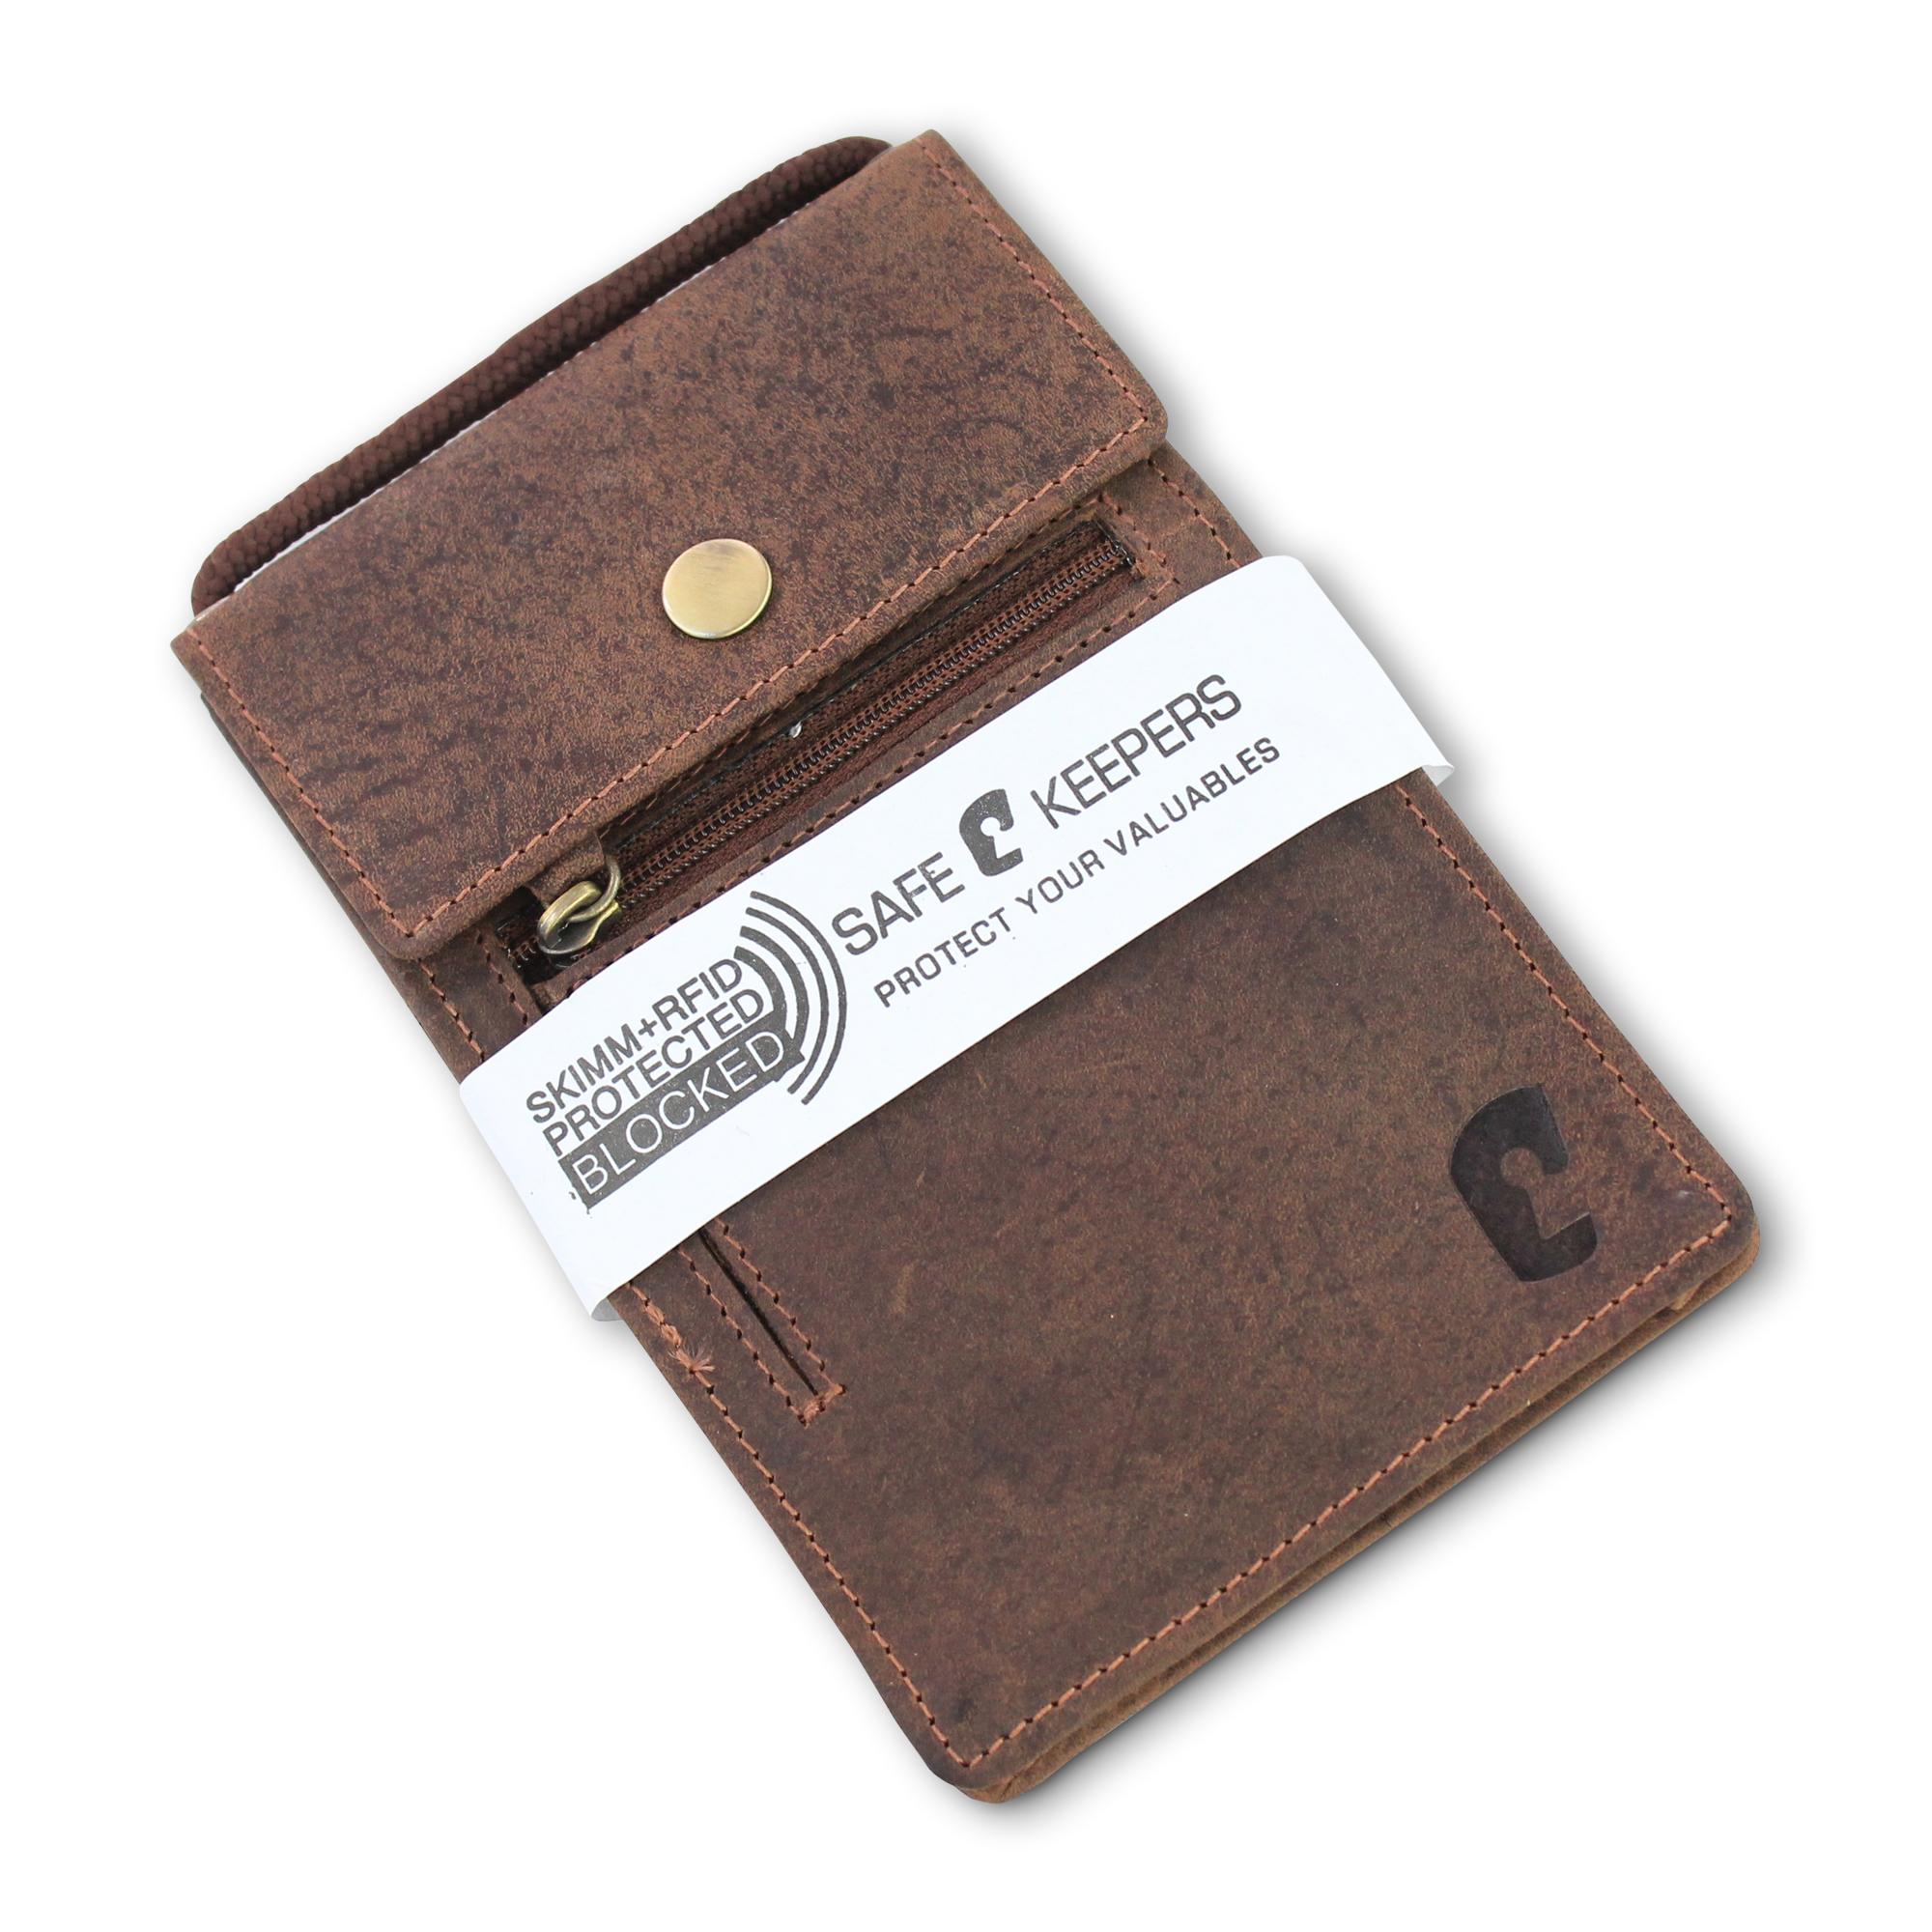 df74e949e99 10 st. Leren XL Paspoort Nektasje / Reistasje voor Iphone 8 RFID ...